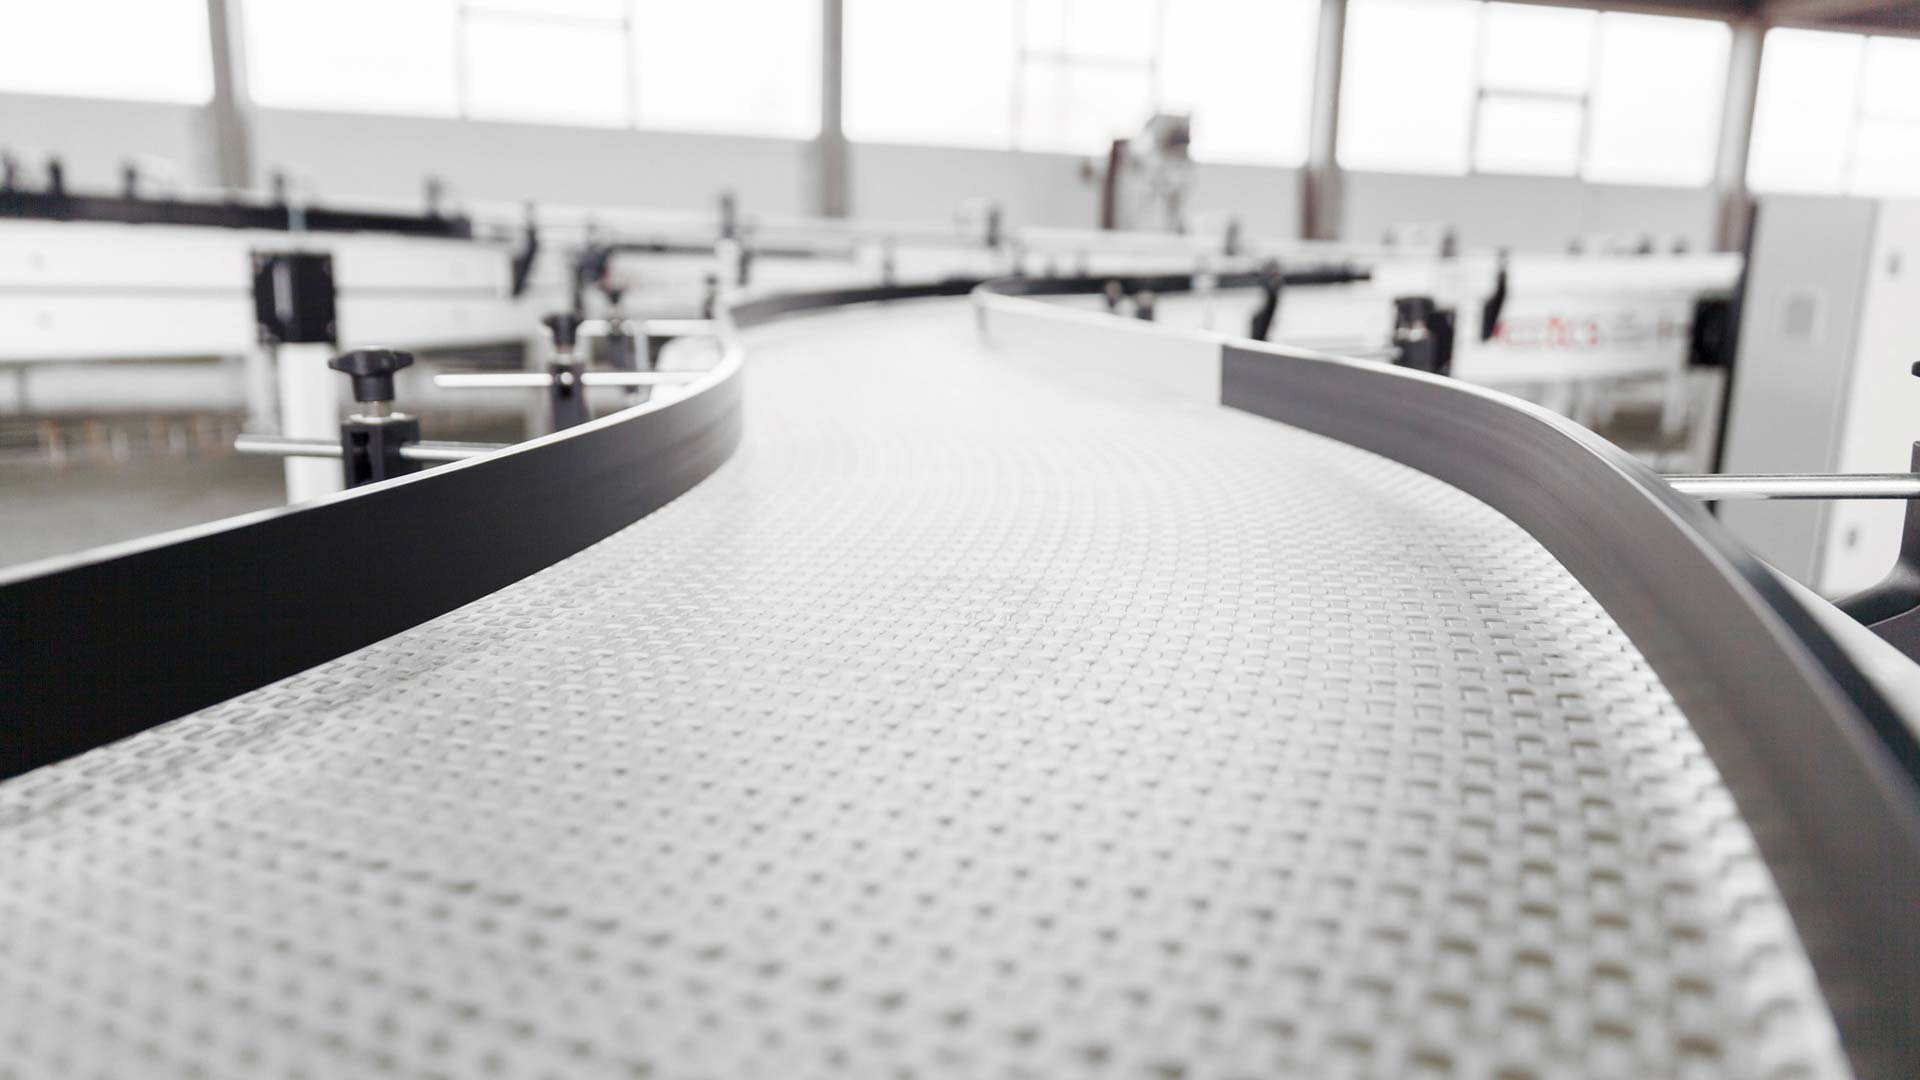 fb-360projektbetreuung-hochleistungssoftware-fb-stash-fb-industry-automation